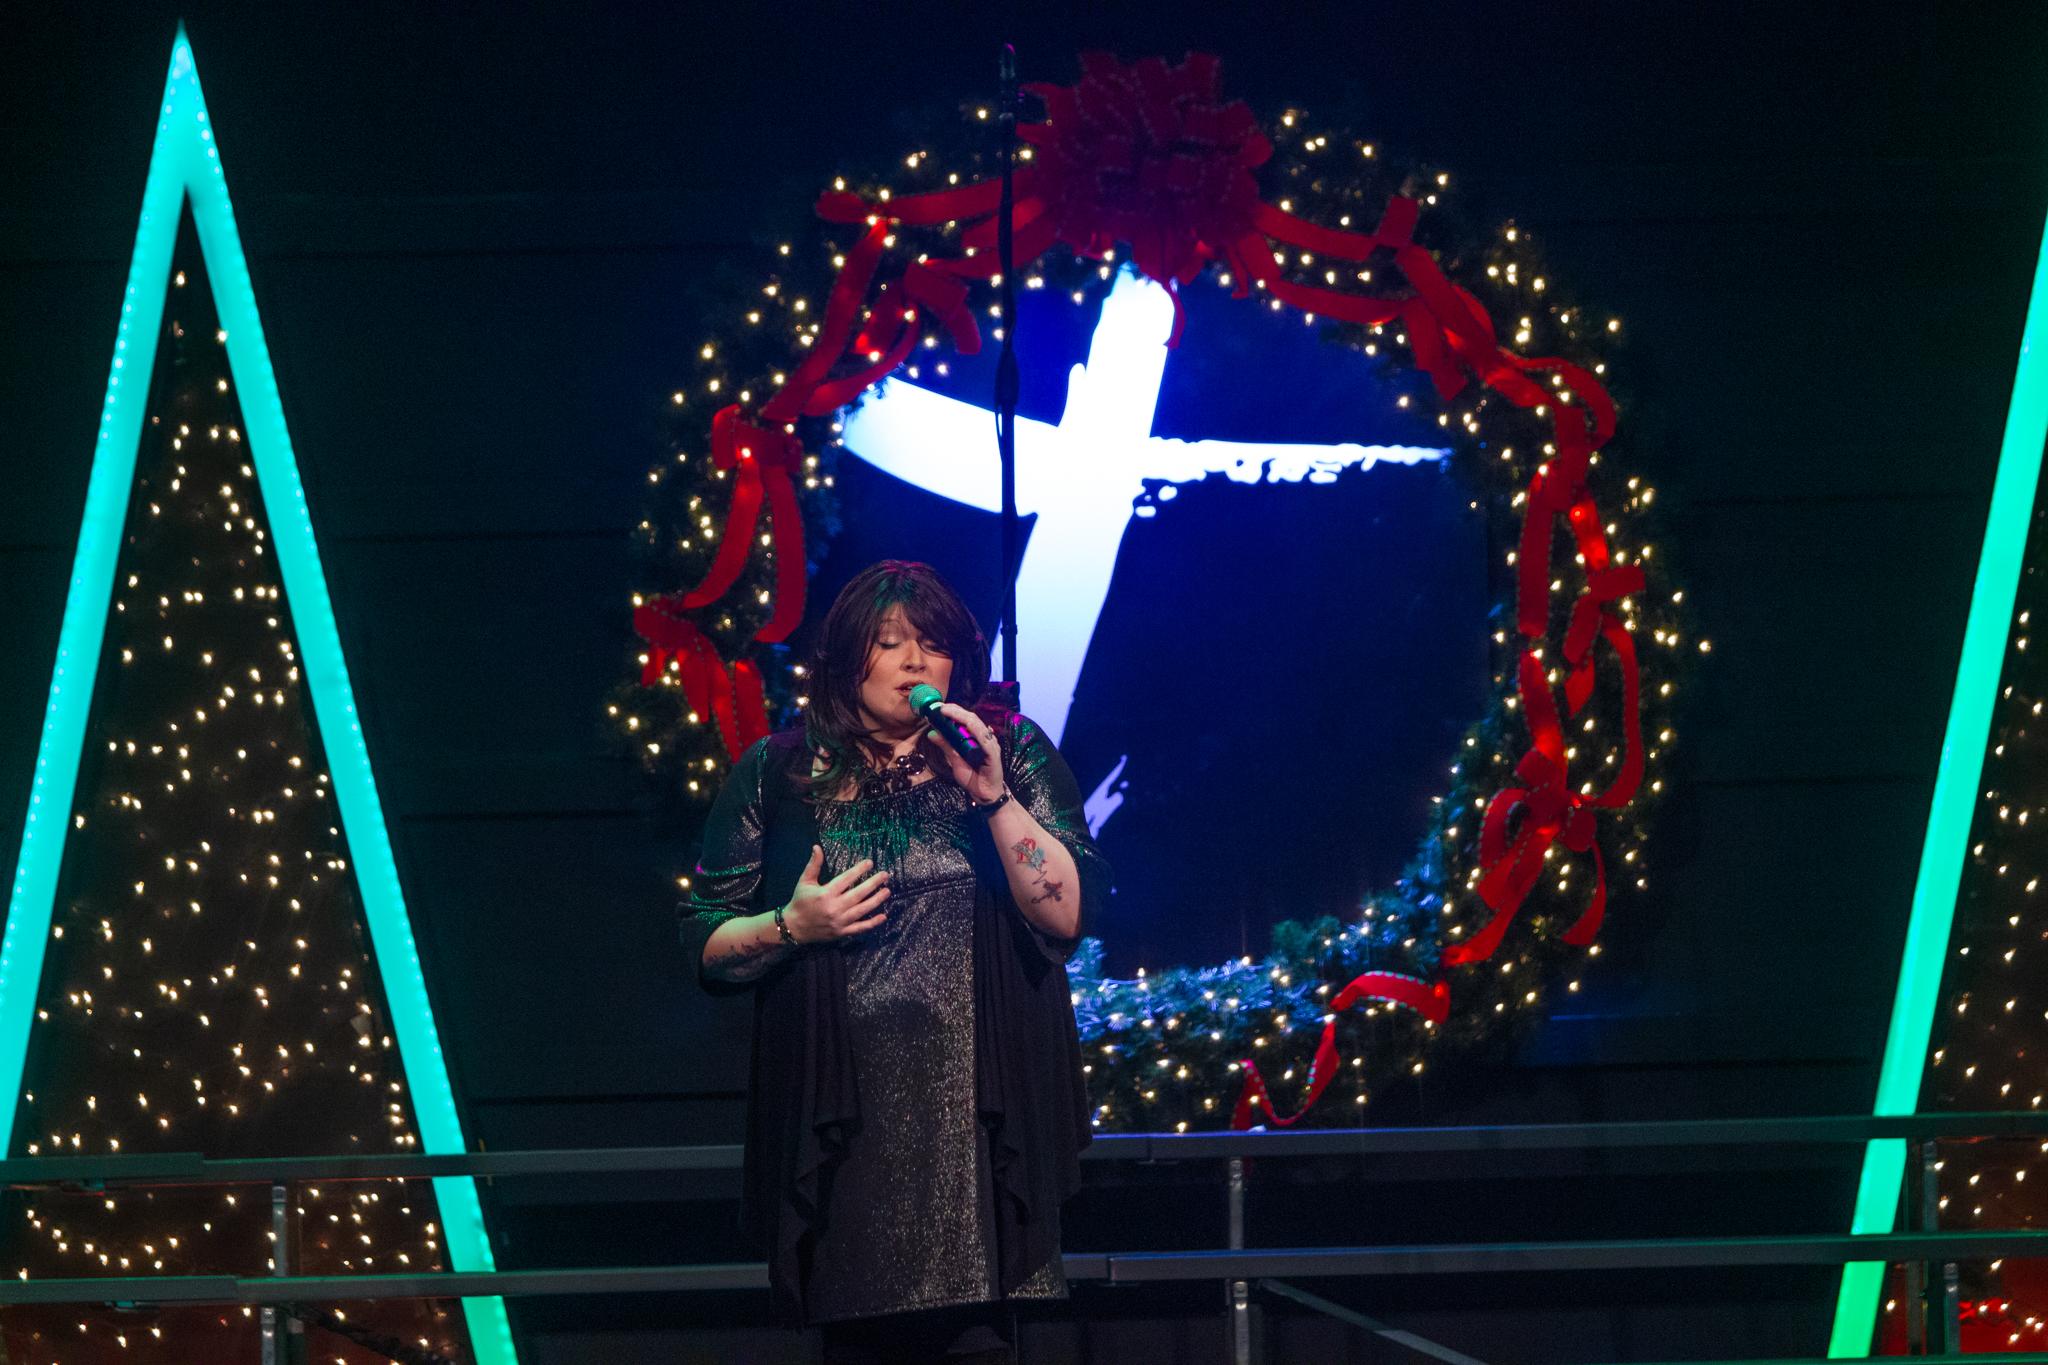 Temple_Christmas_2018 (21 of 63).jpg